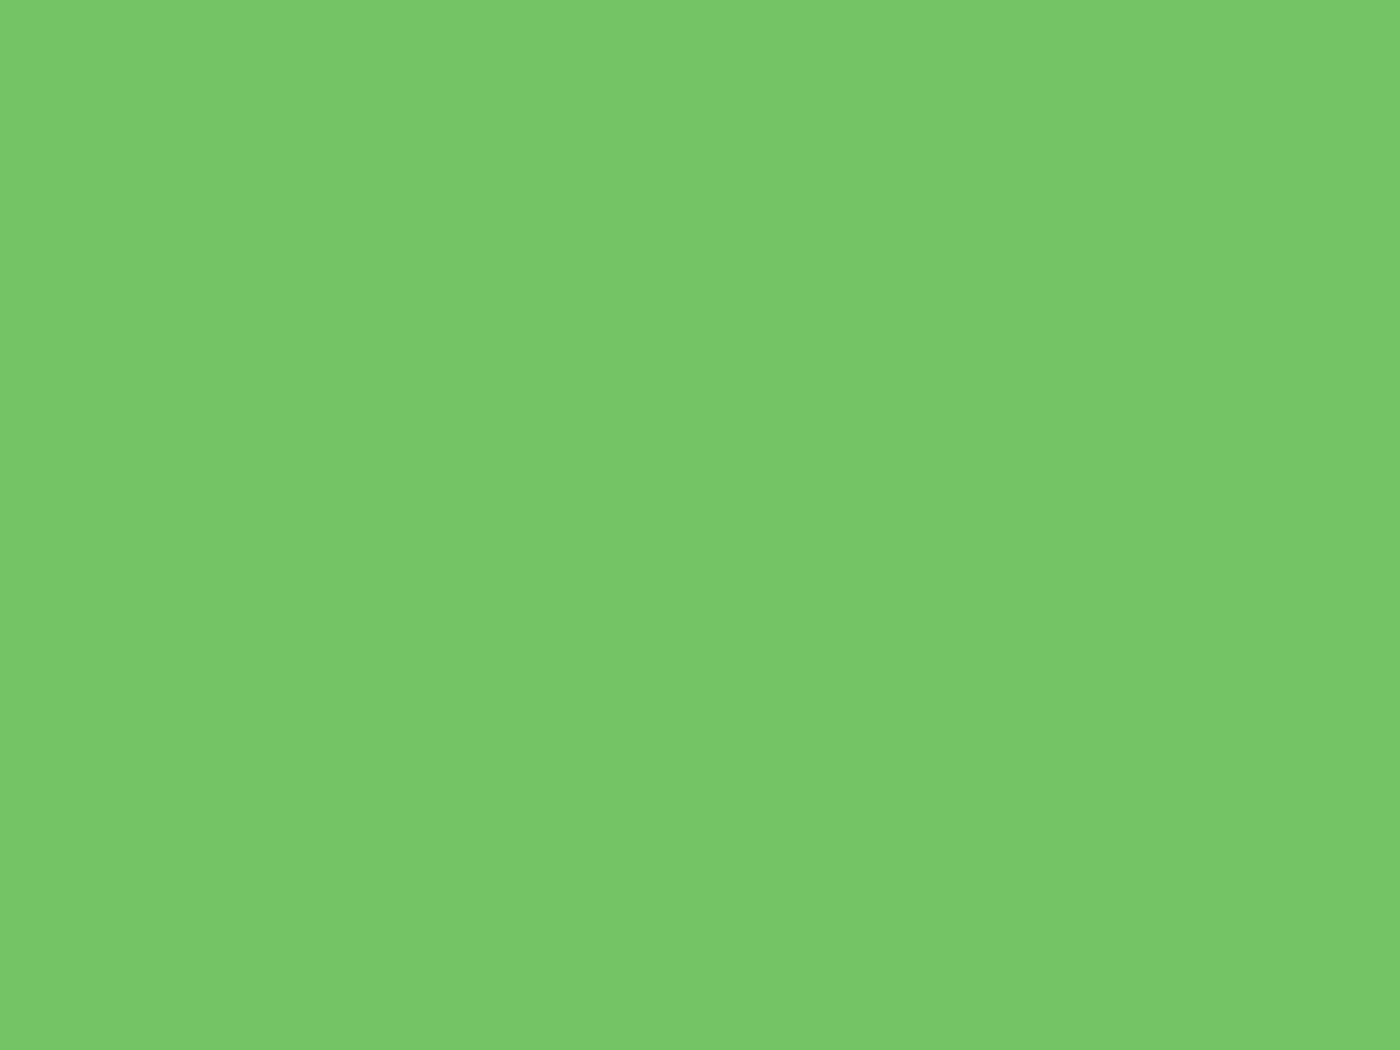 1400x1050 Mantis Solid Color Background